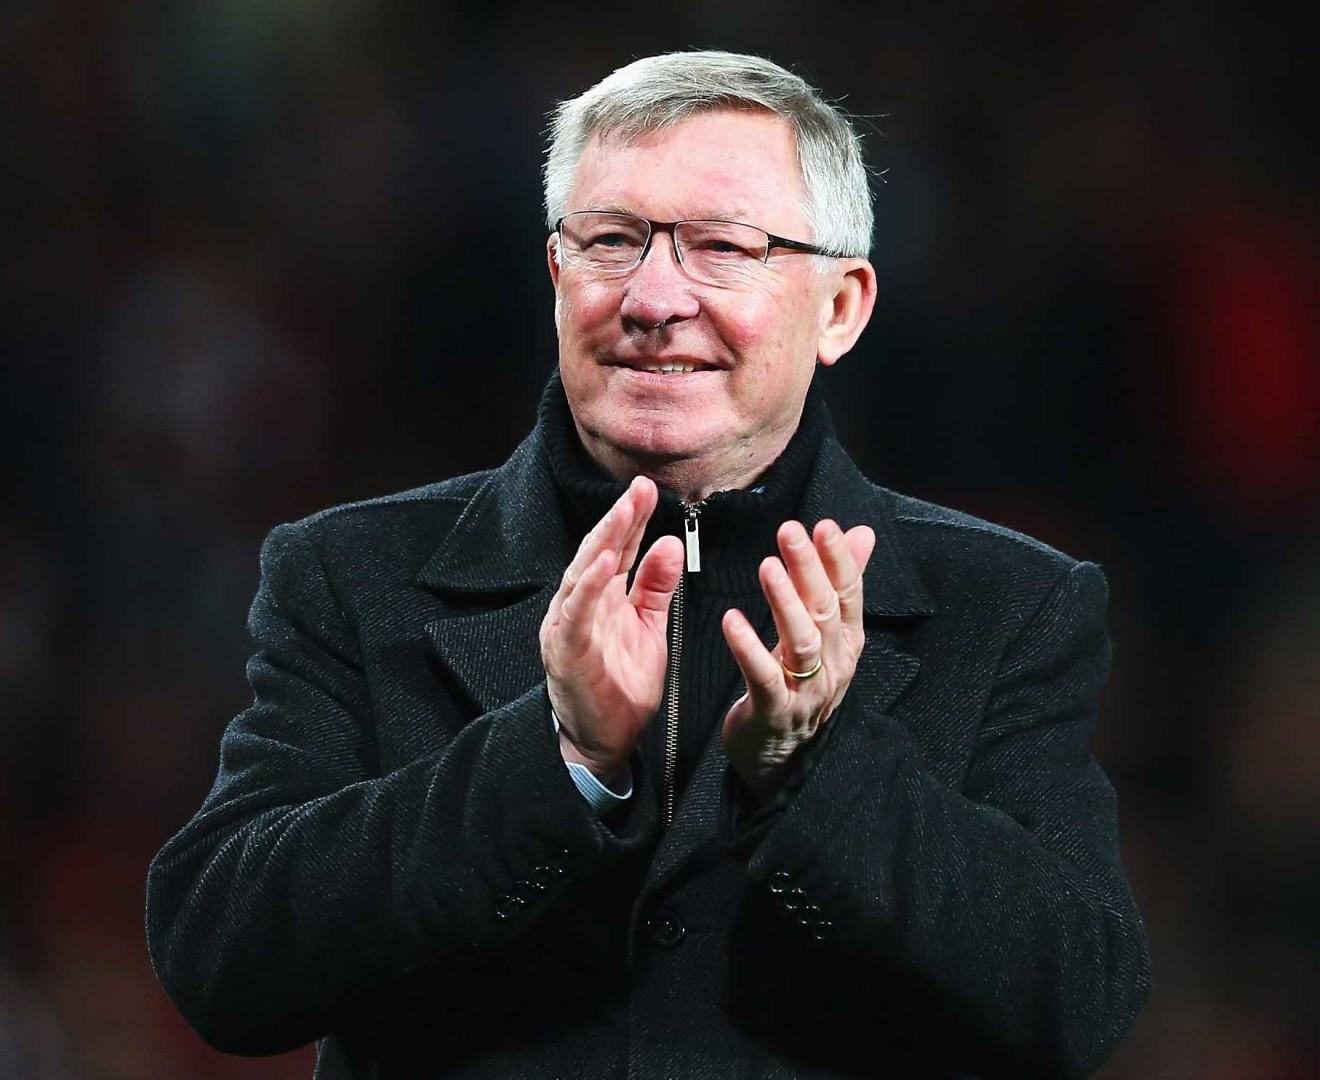 Interview with Sir Alex Ferguson